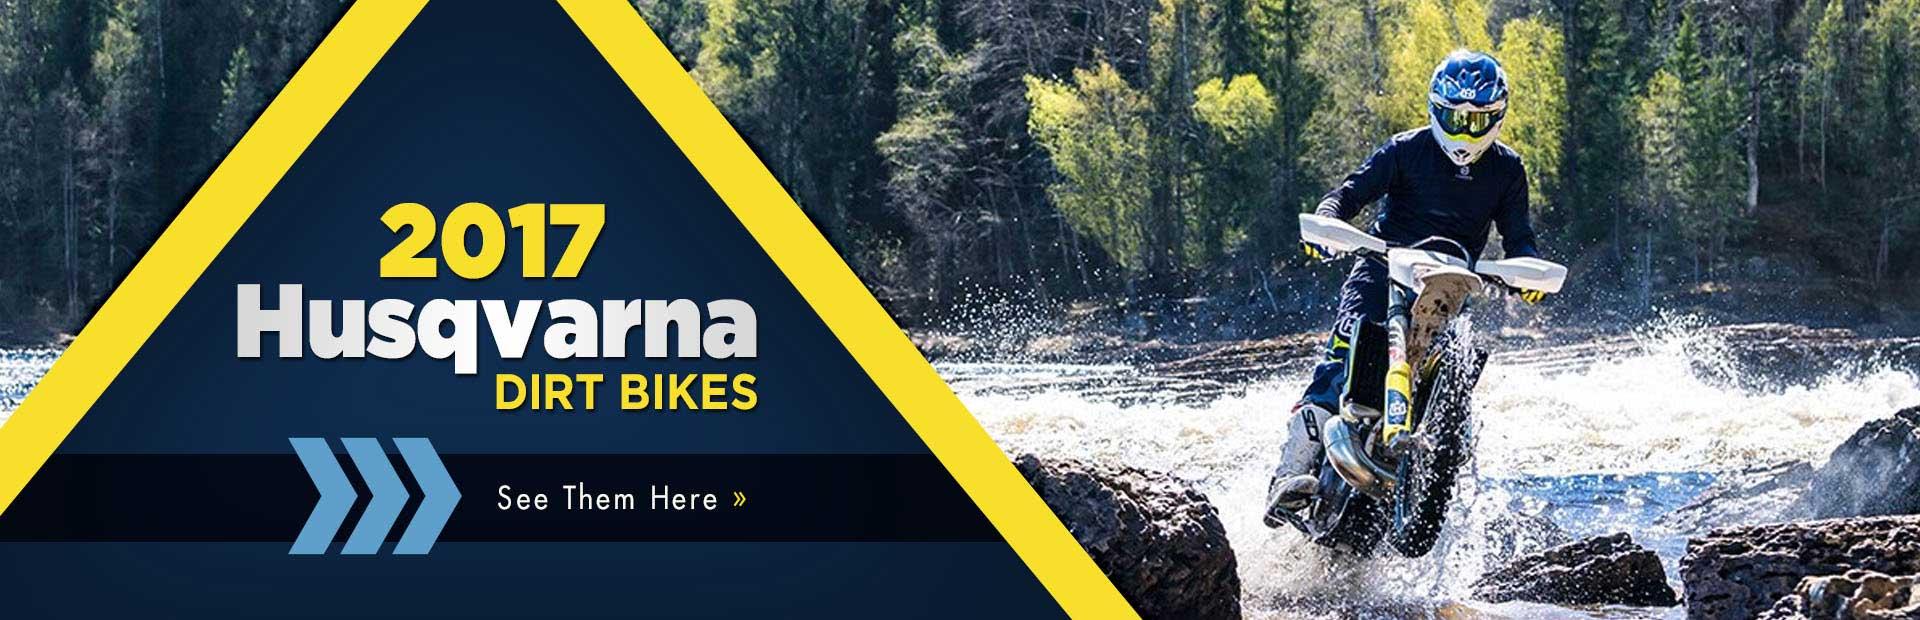 2017 Husqvarna Dirt Bikes: Click here to view the models.